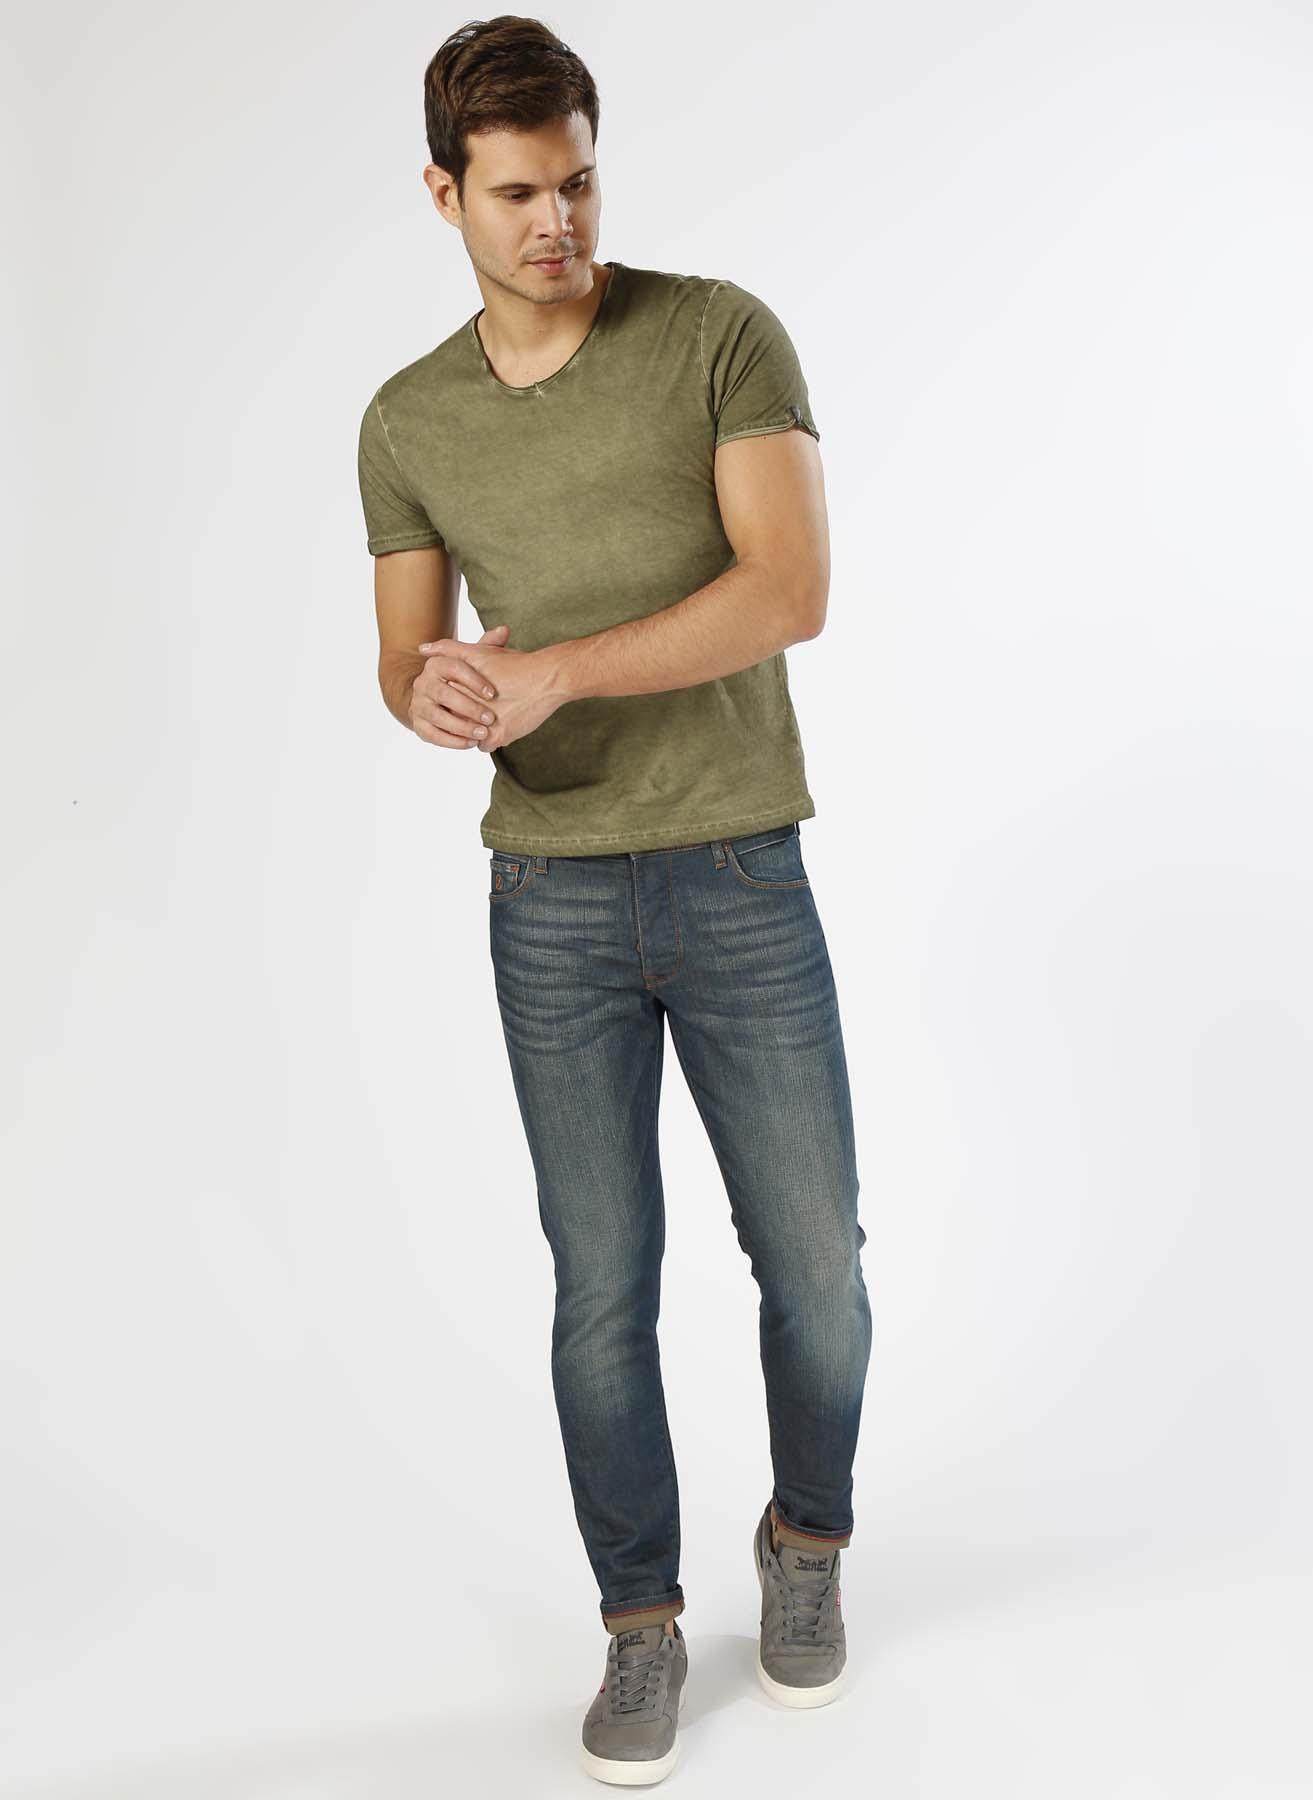 Loft Mavi Klasik Pantolon 34-32 5000202025013 Ürün Resmi